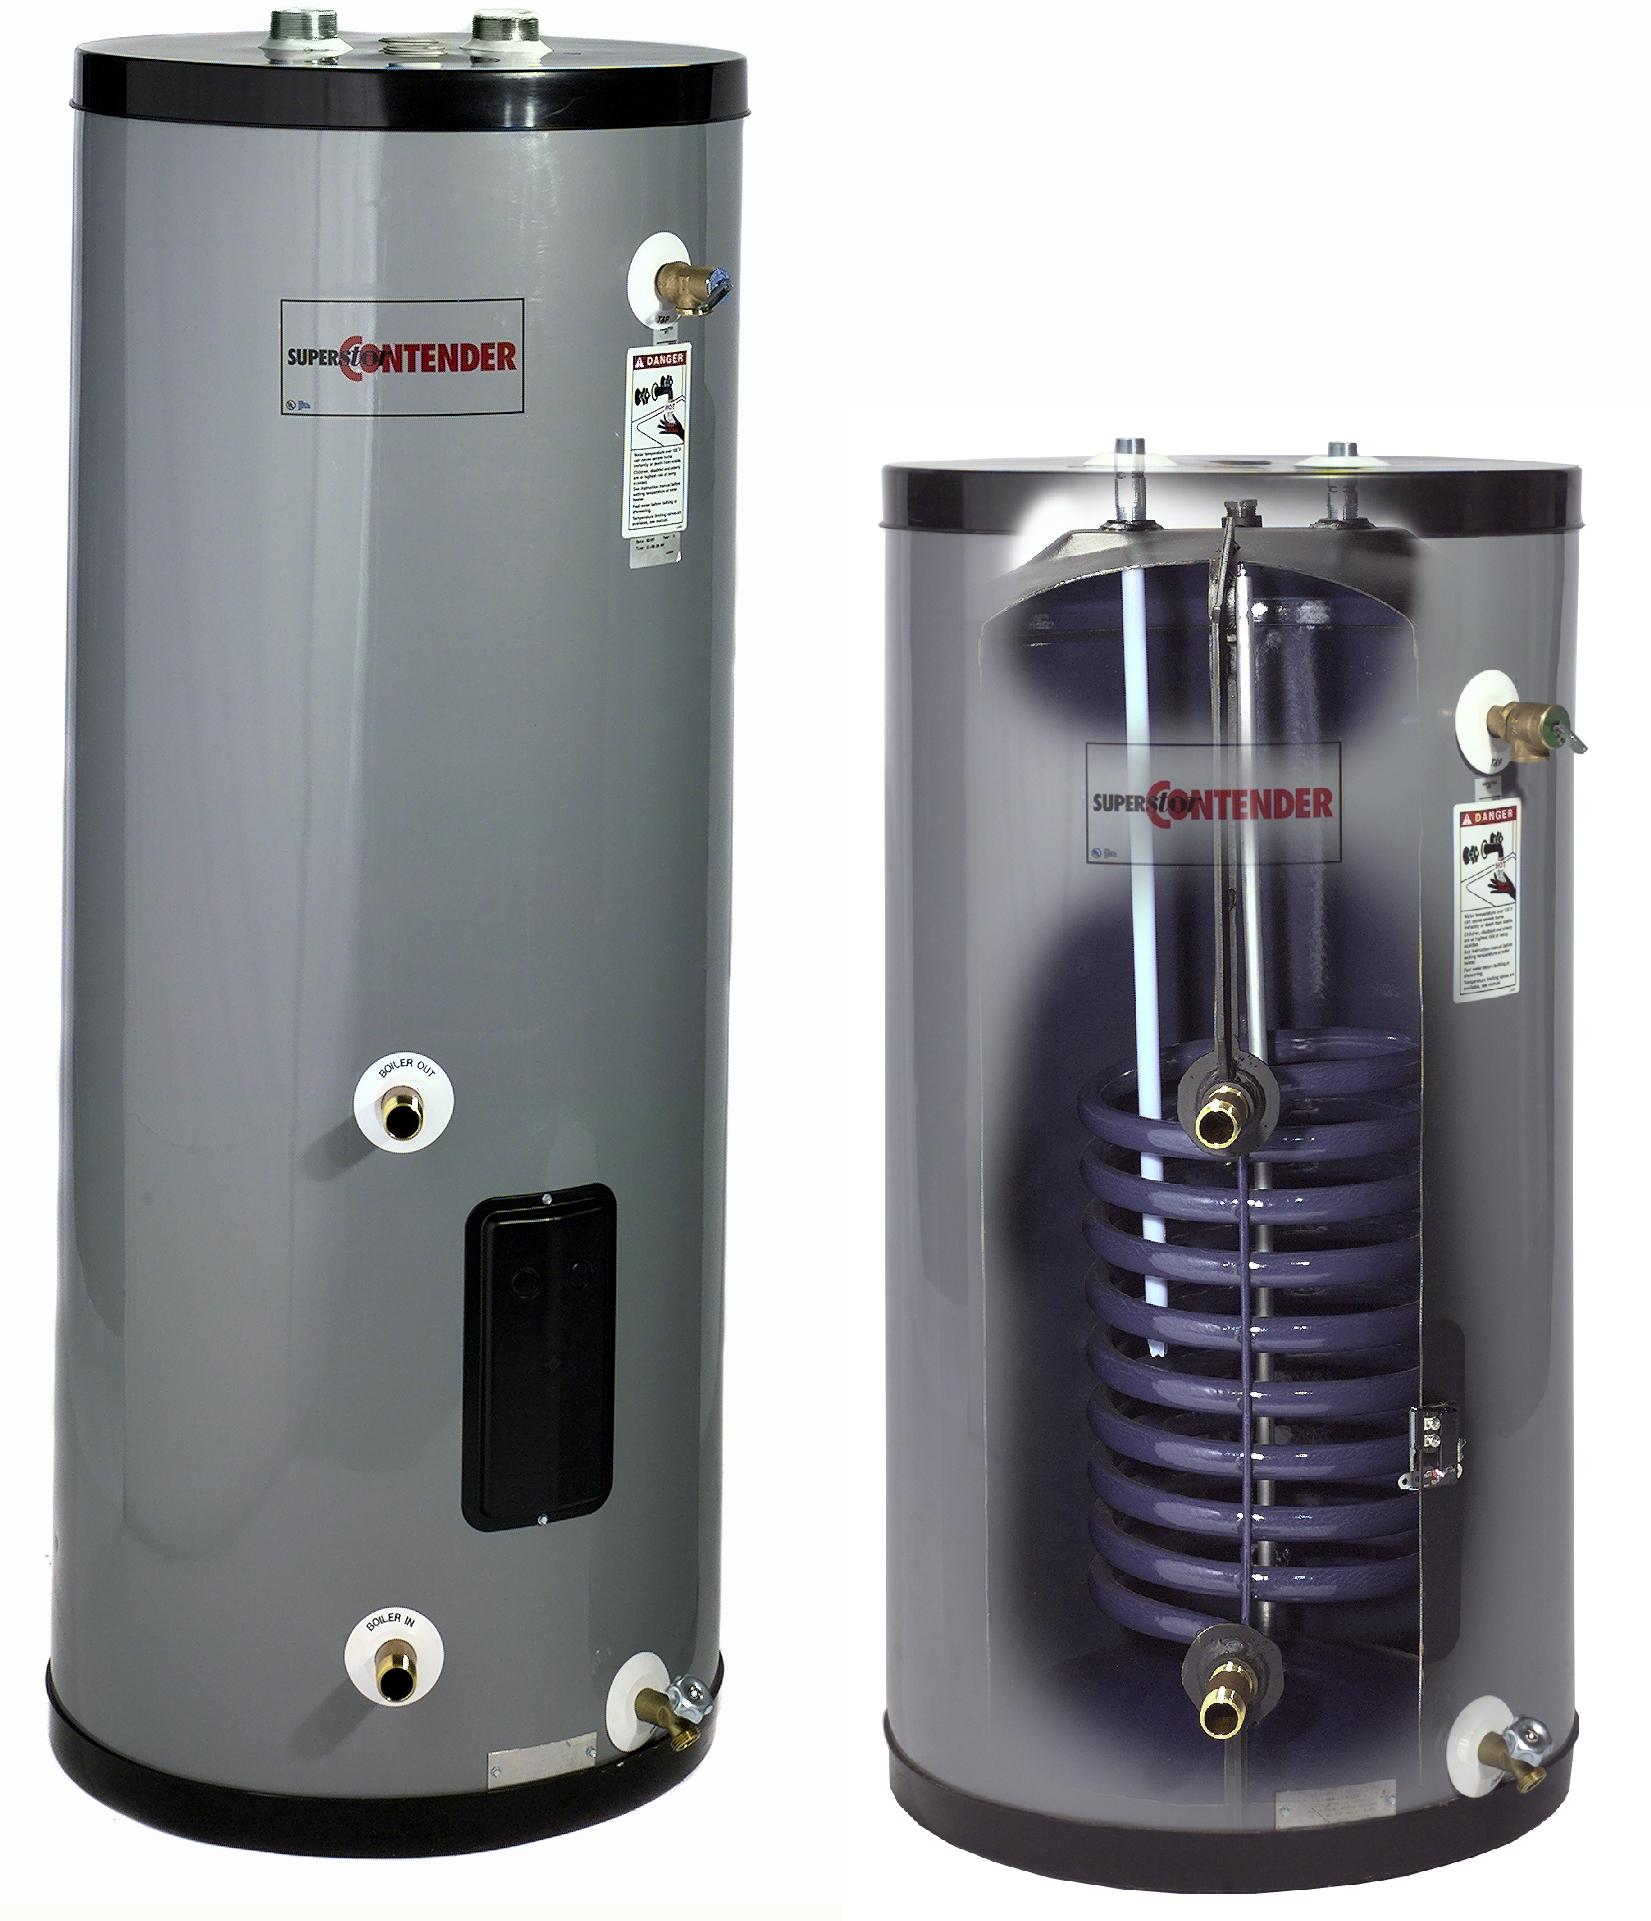 Hot Water Heater : Minanda homemade wood hot water heater guide